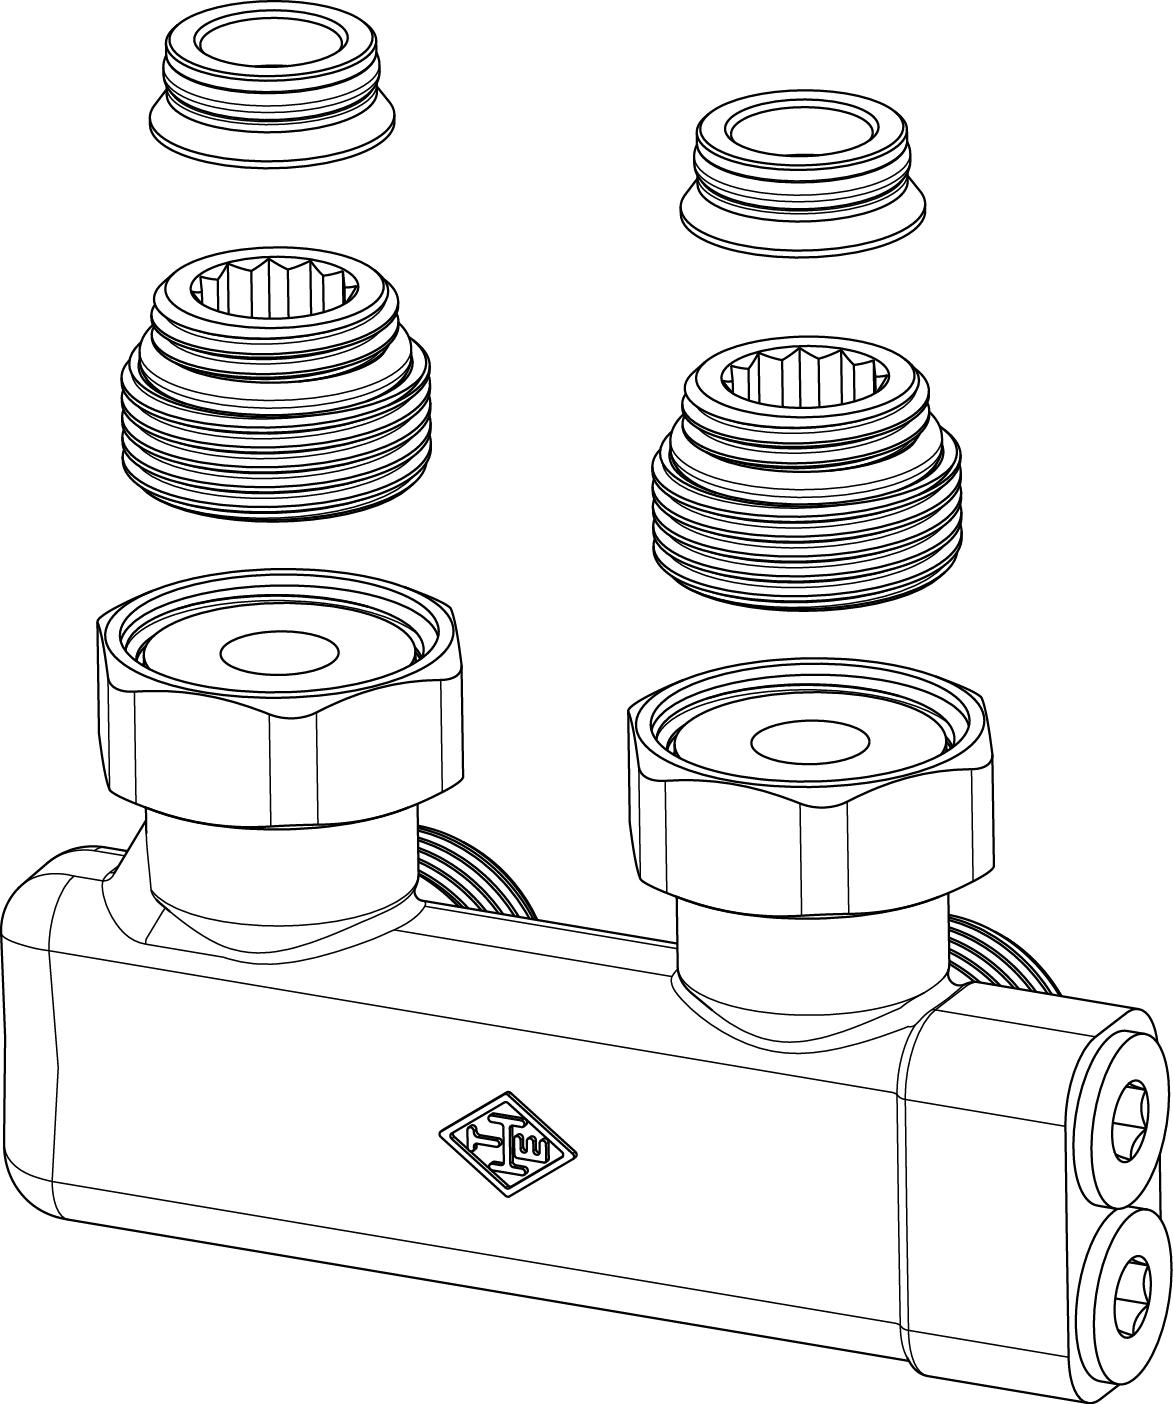 1173x1404 Vekolux Valves For Radiators With Integrated Valve